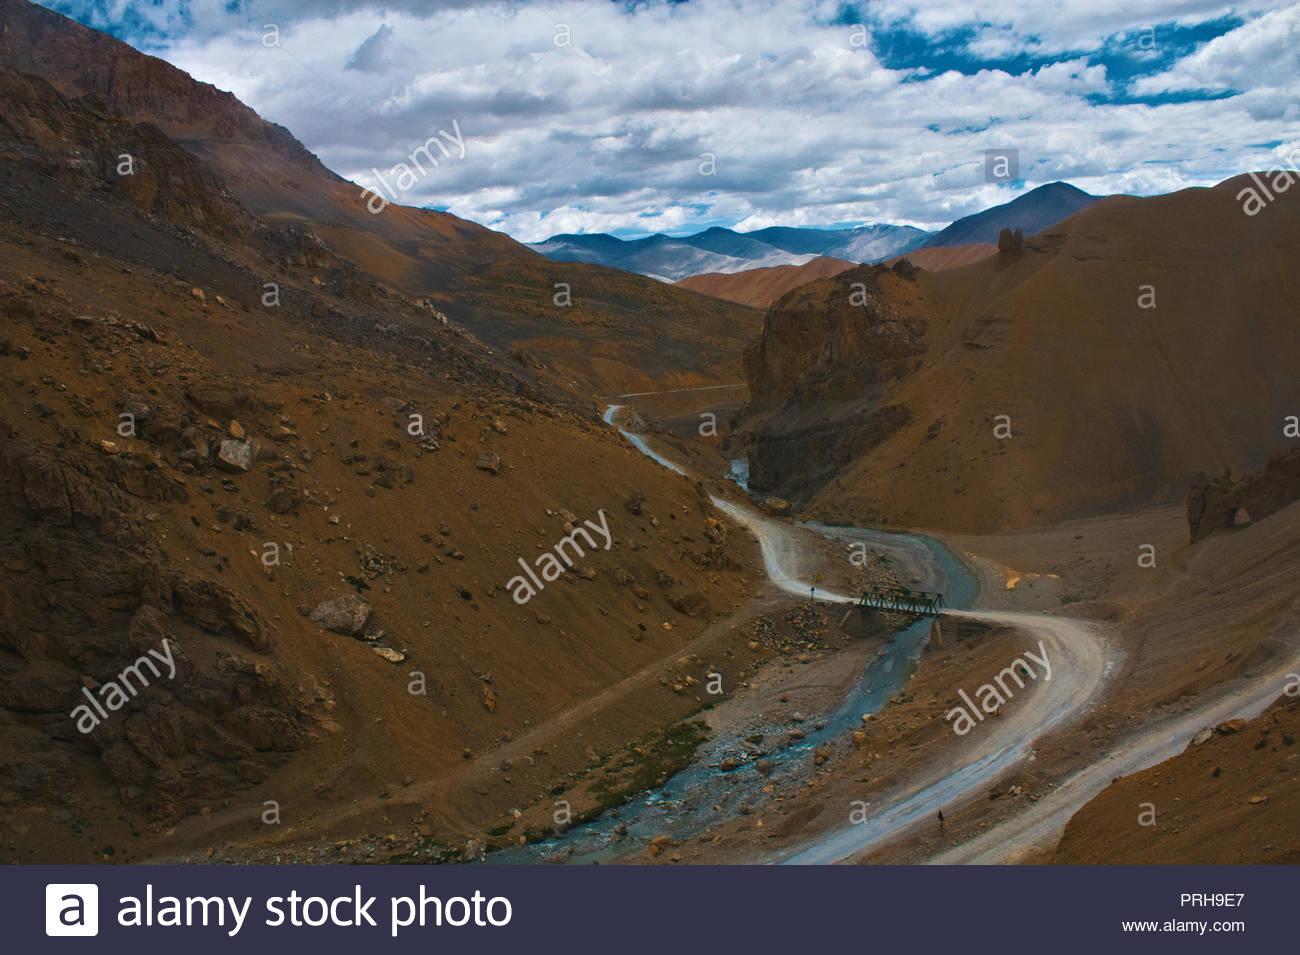 Valley view towards Pang, Ladakh while climbing Lachung La Pass - Stock Image